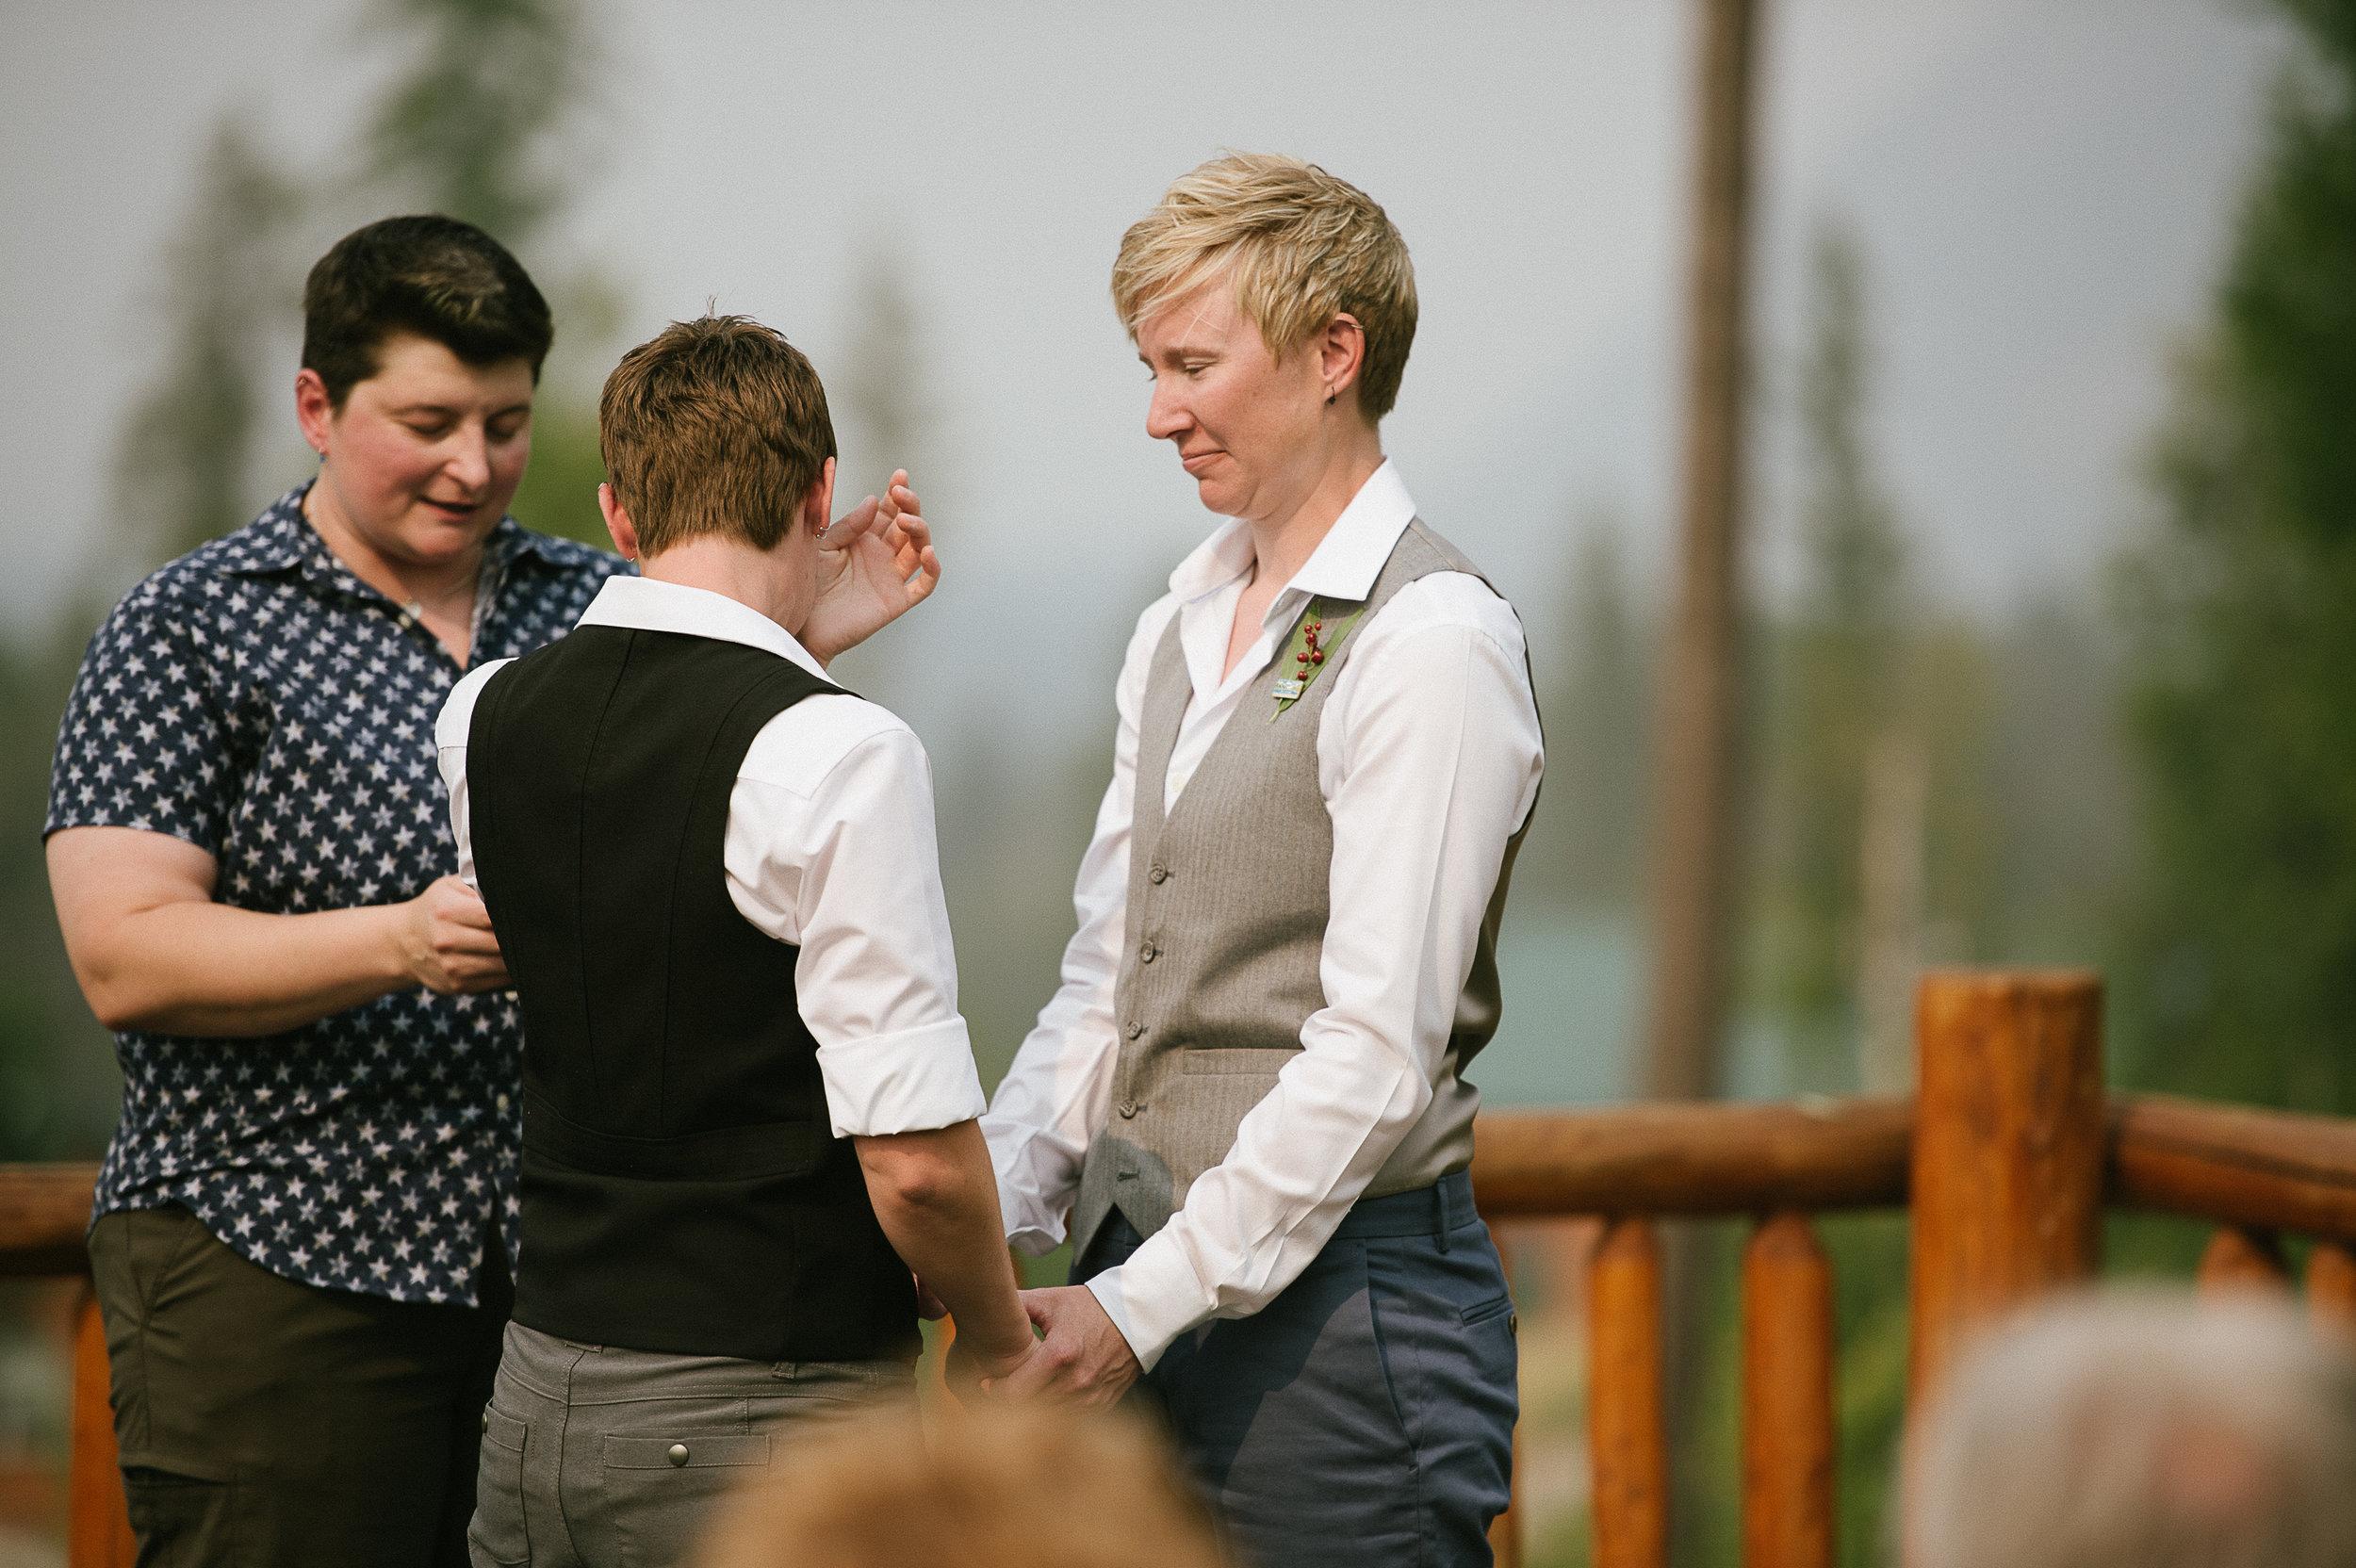 Glacier Montana Wedding_Elly Maurer + Frankie Dashiell Wedding_Beautiful Outdoor Wedding_Kelsey Lane Photography-4914.jpg